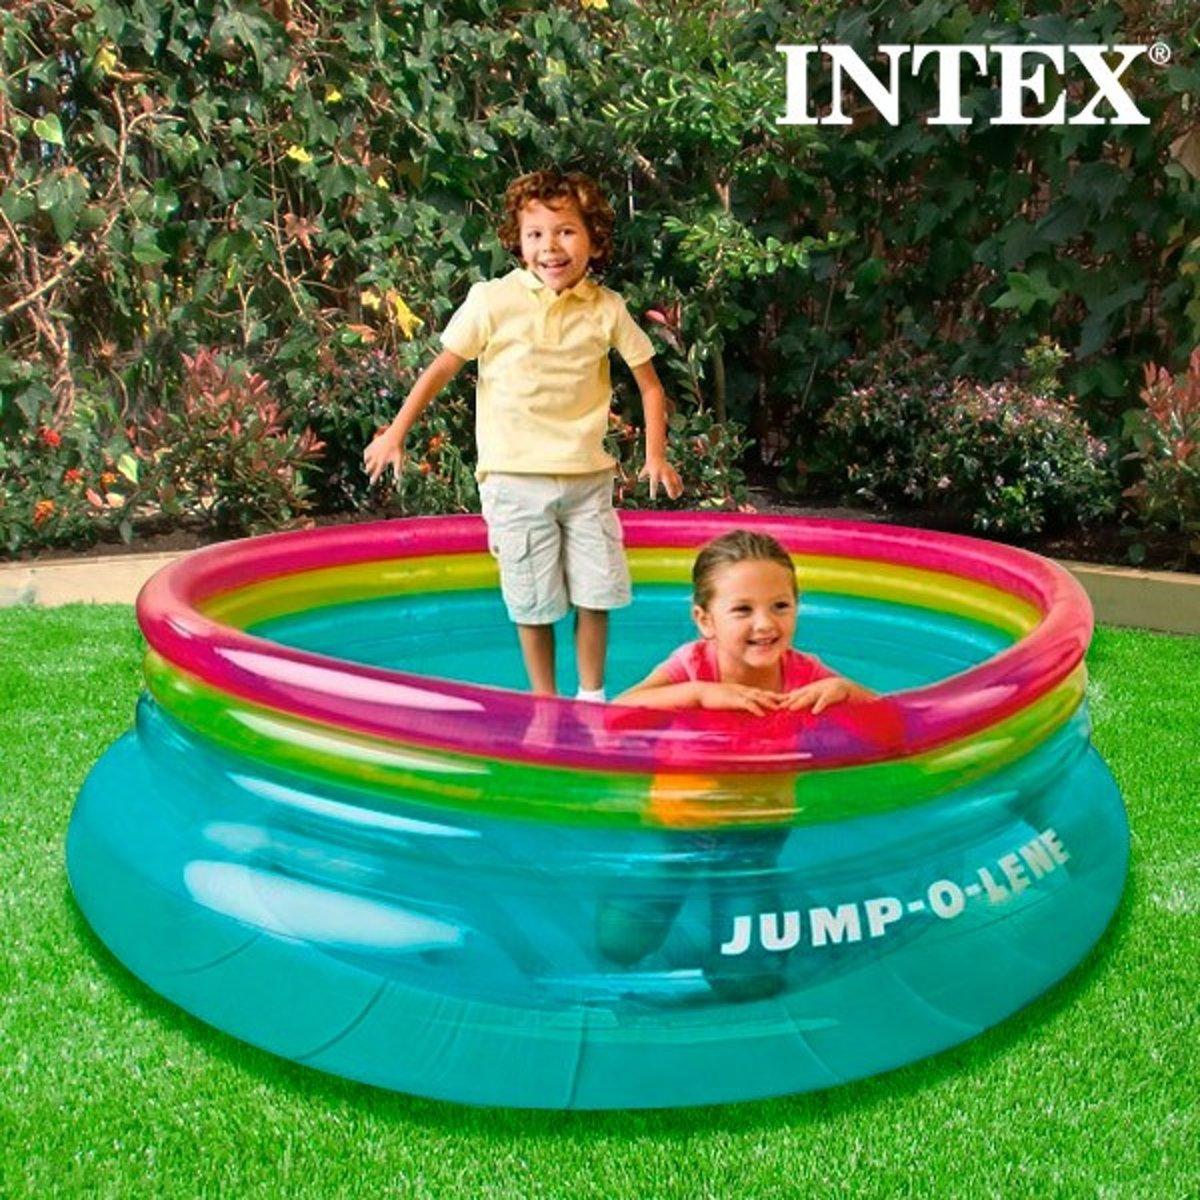 Intex Opblaasbare Tuimelaar